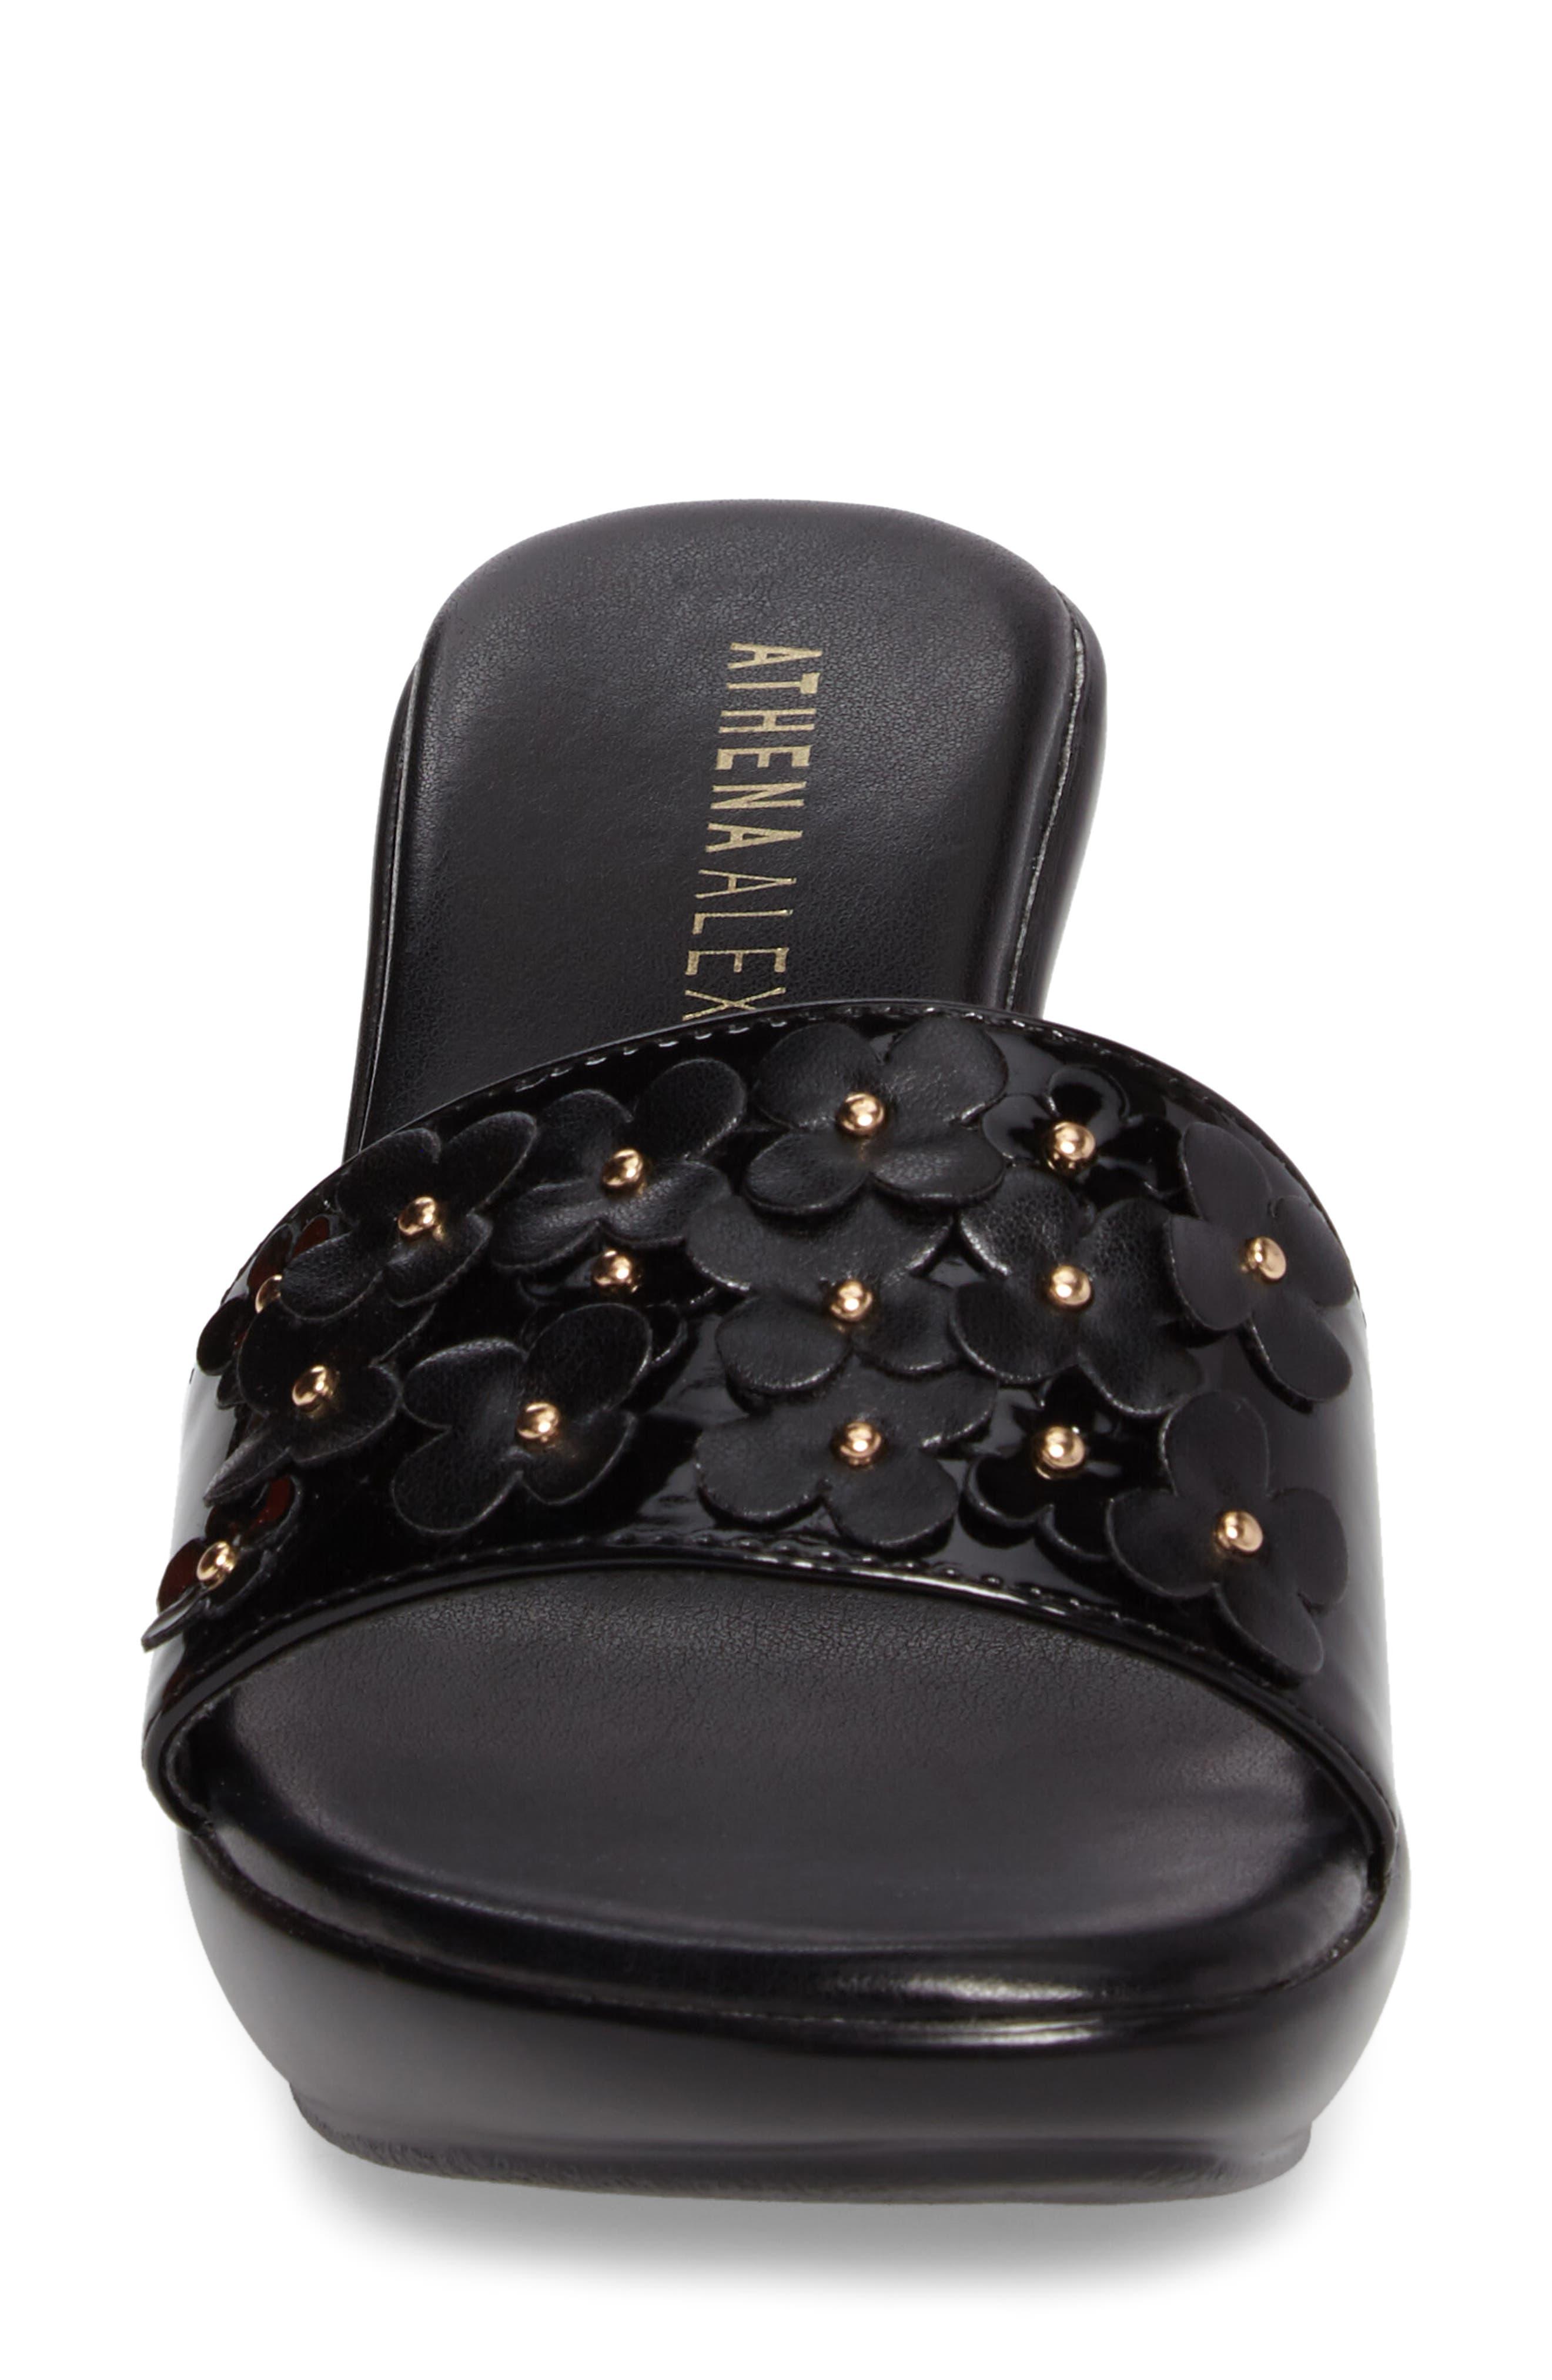 Allegra Wedge Slide,                             Alternate thumbnail 4, color,                             Black Faux Leather